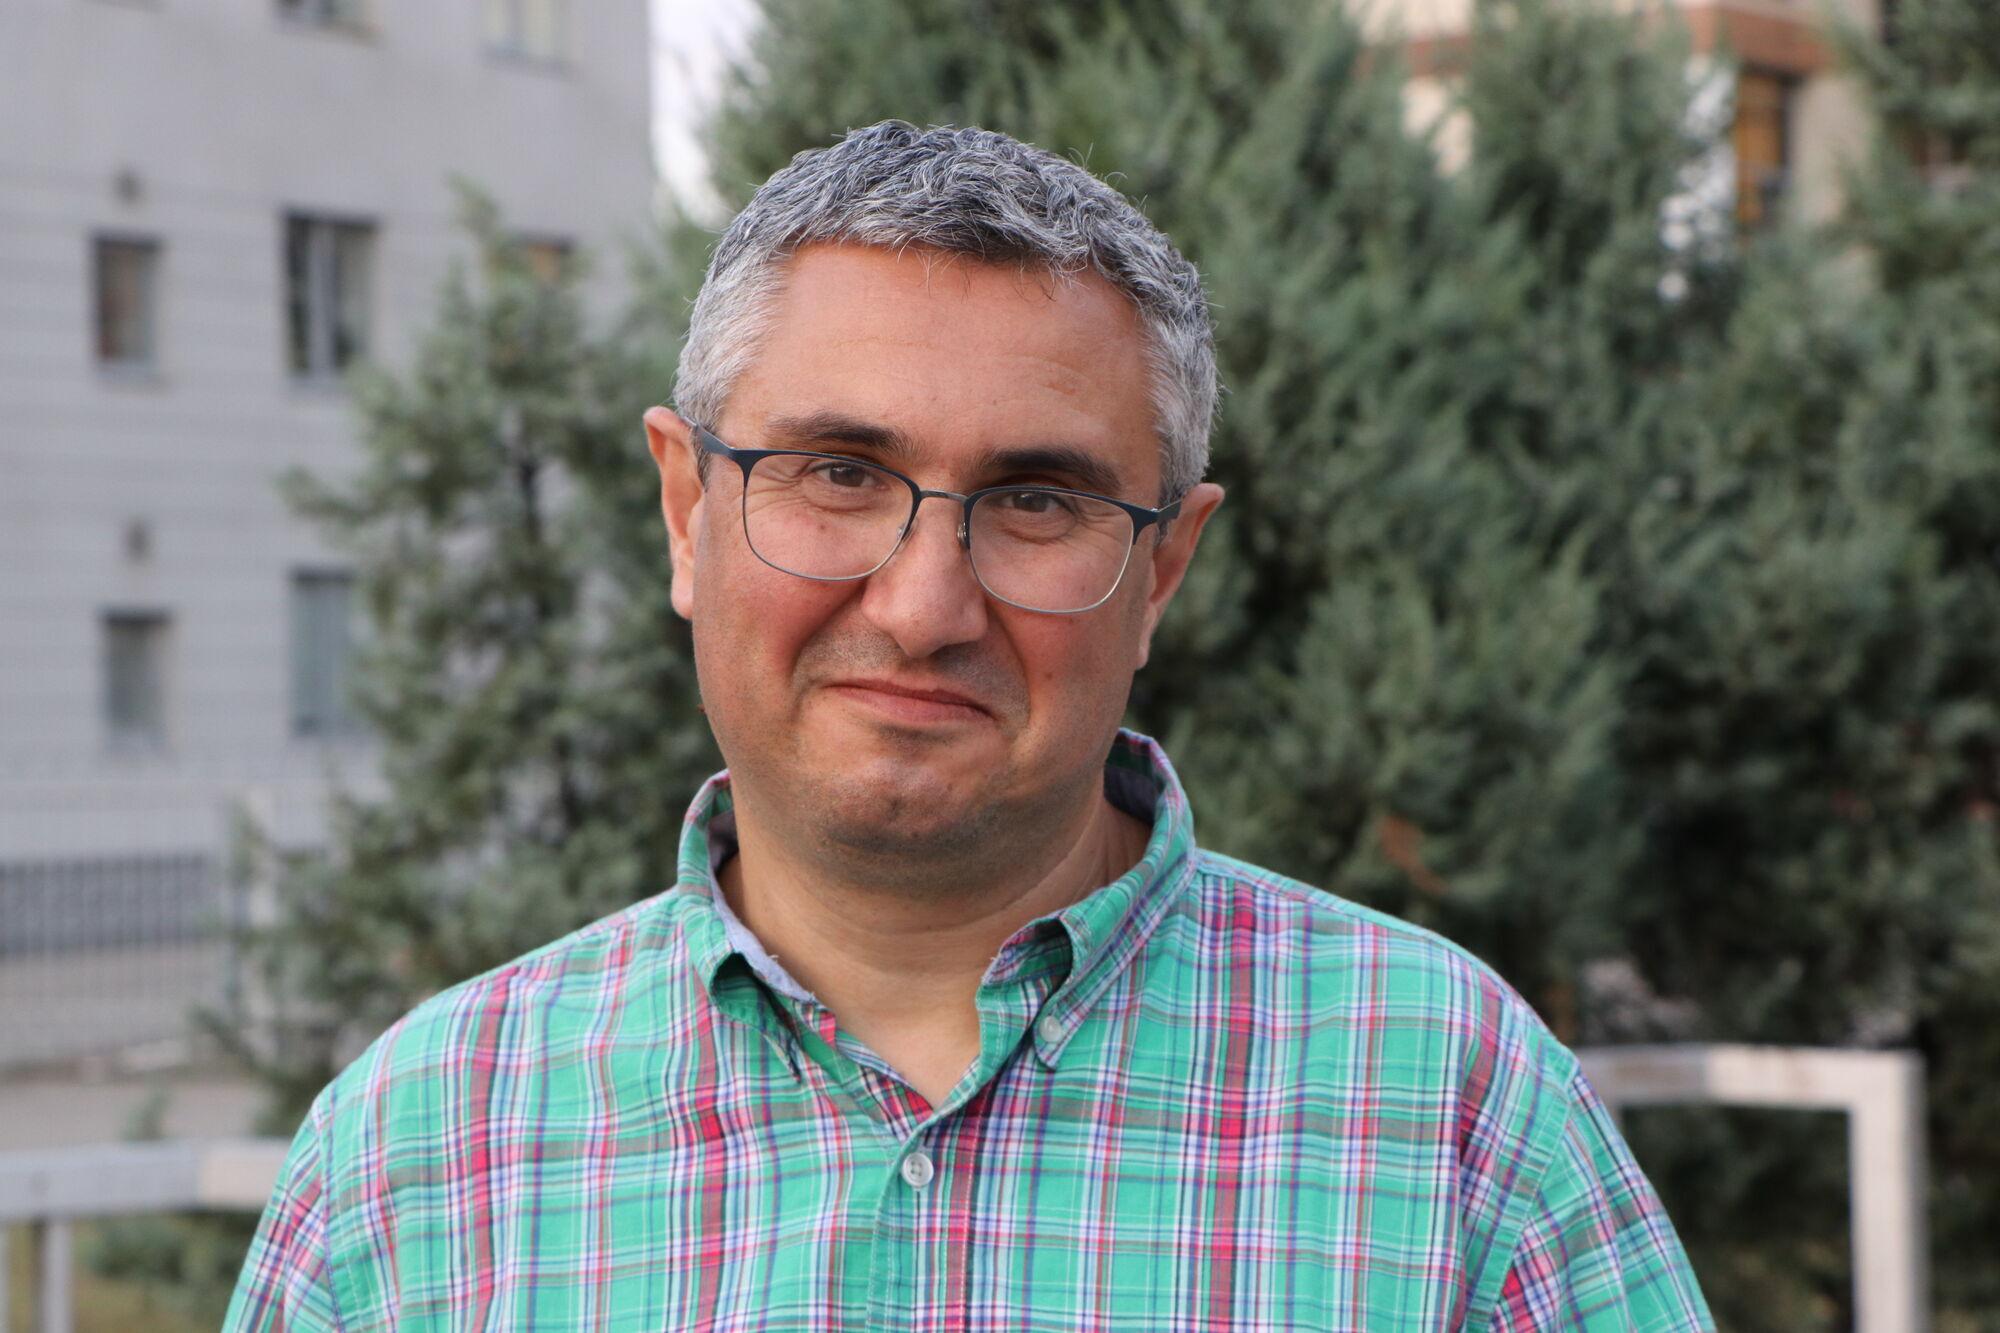 журналіст Вахтанг Кіпіані